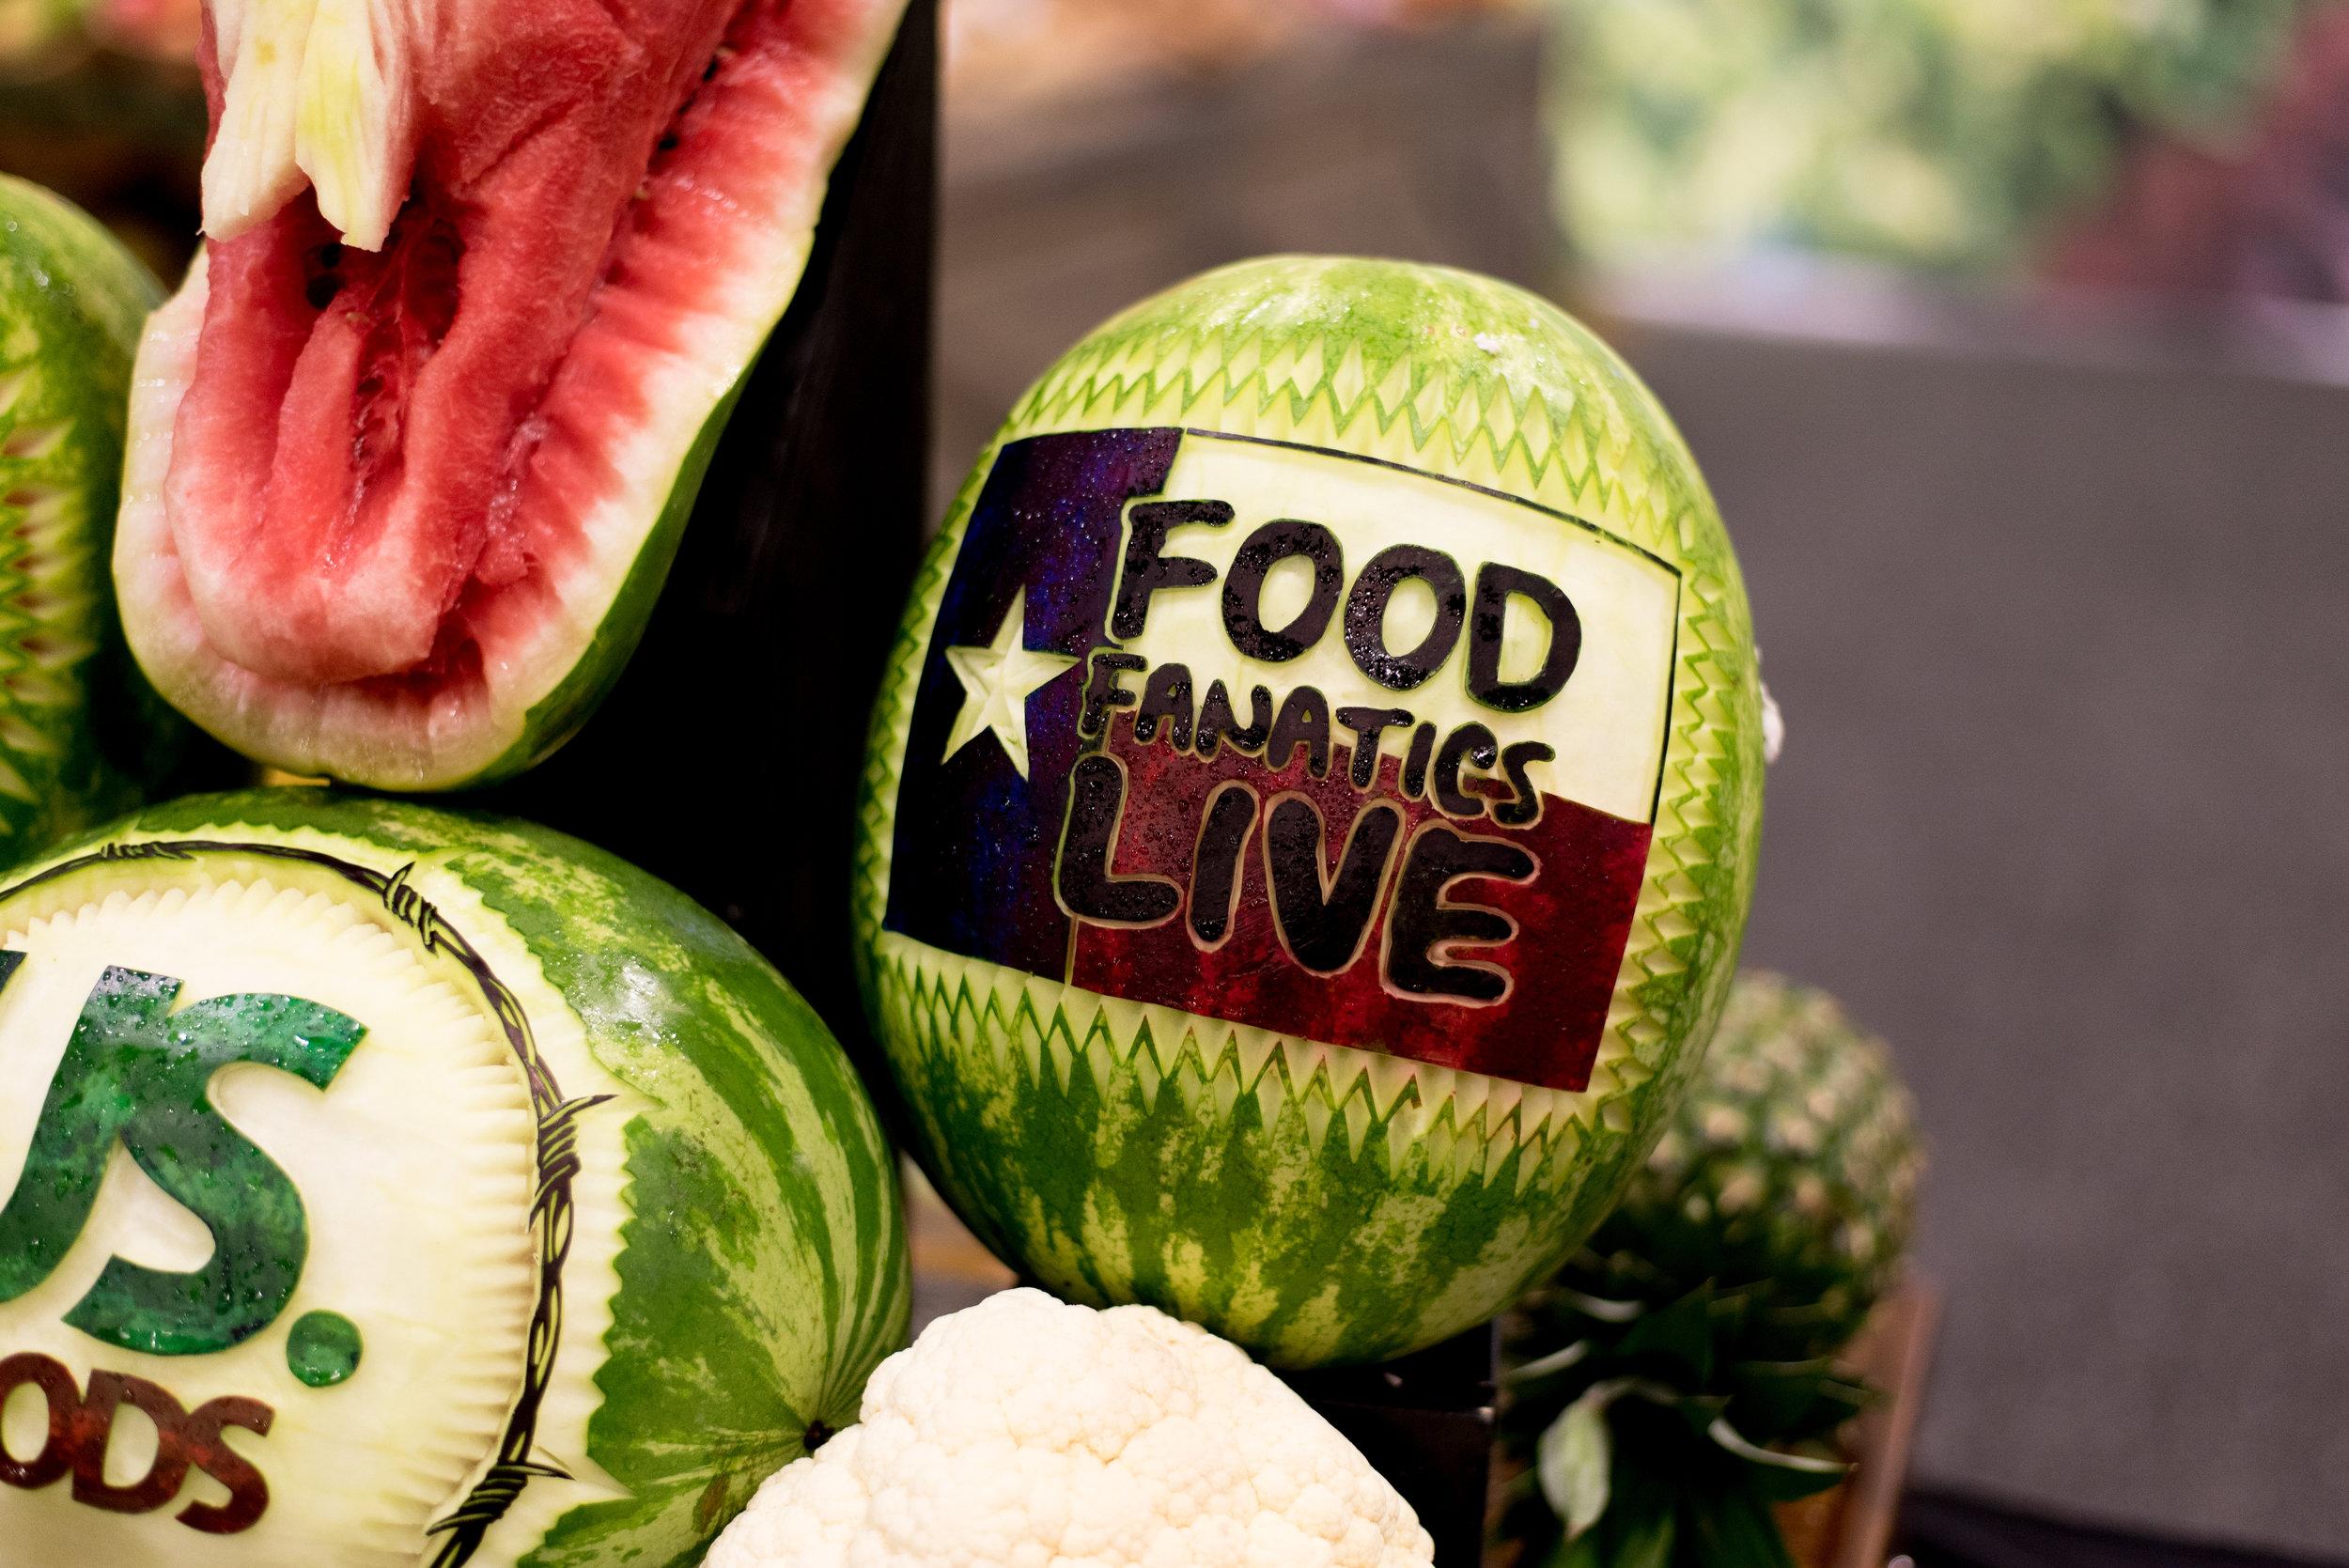 FoodFanaticsLive-Event-Food-Photography085.jpg